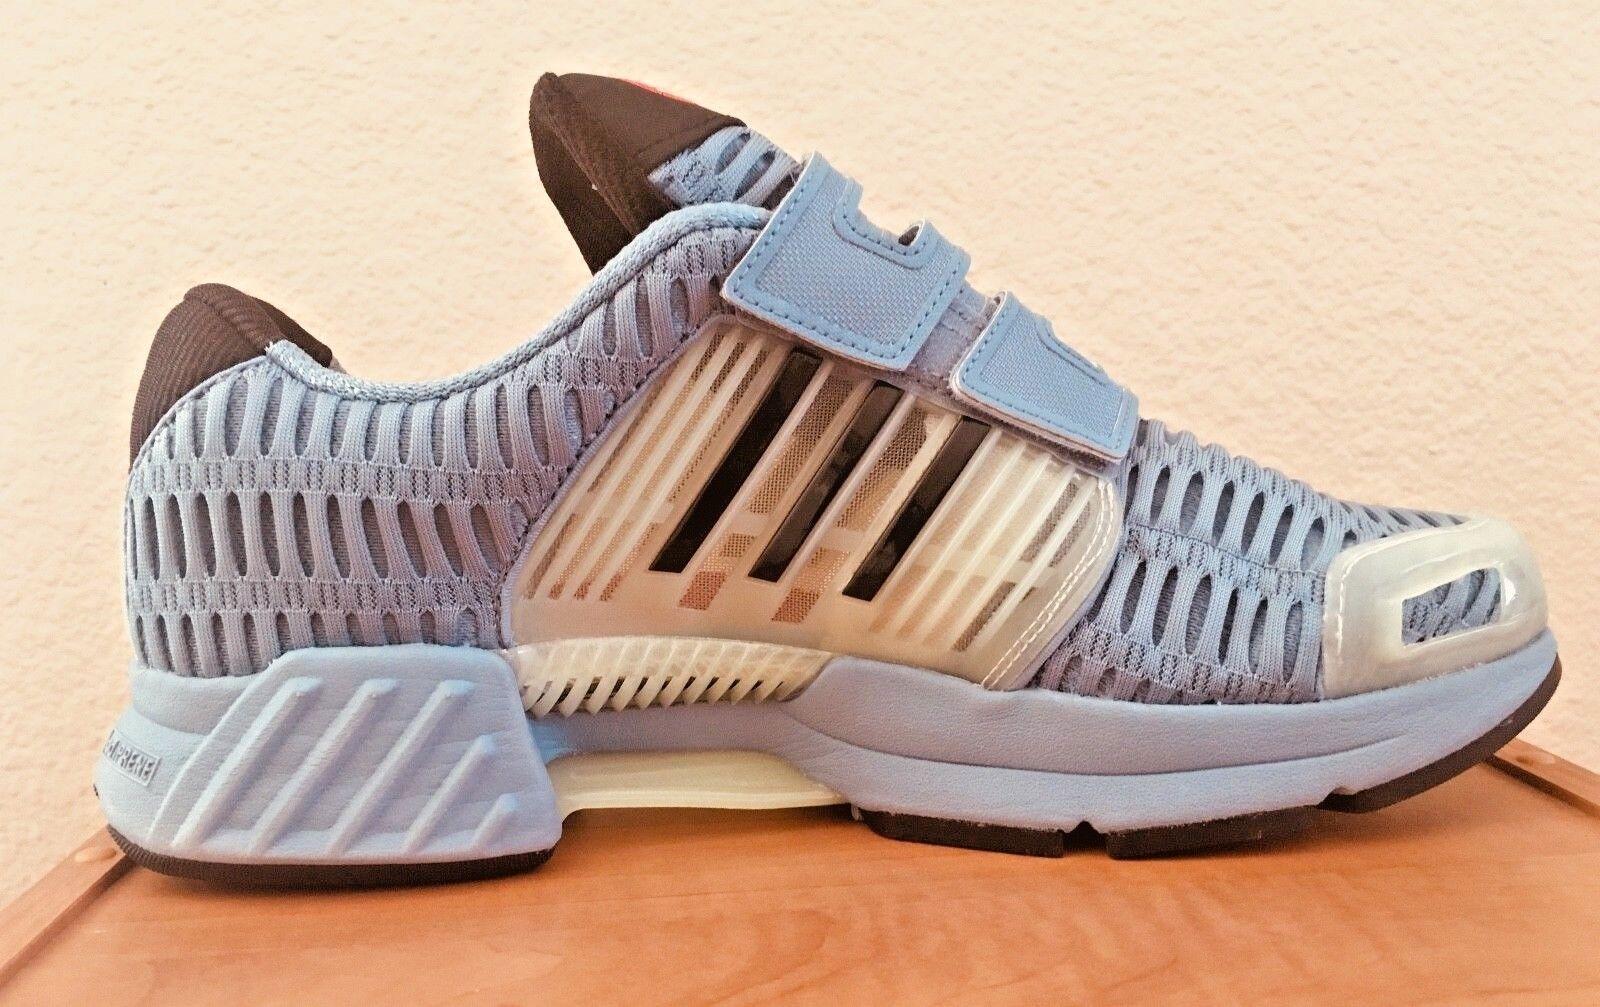 51df181b1939 adidas Originals Climacool 1 CMF Men s Running Shoes Blue BA7267 for ...